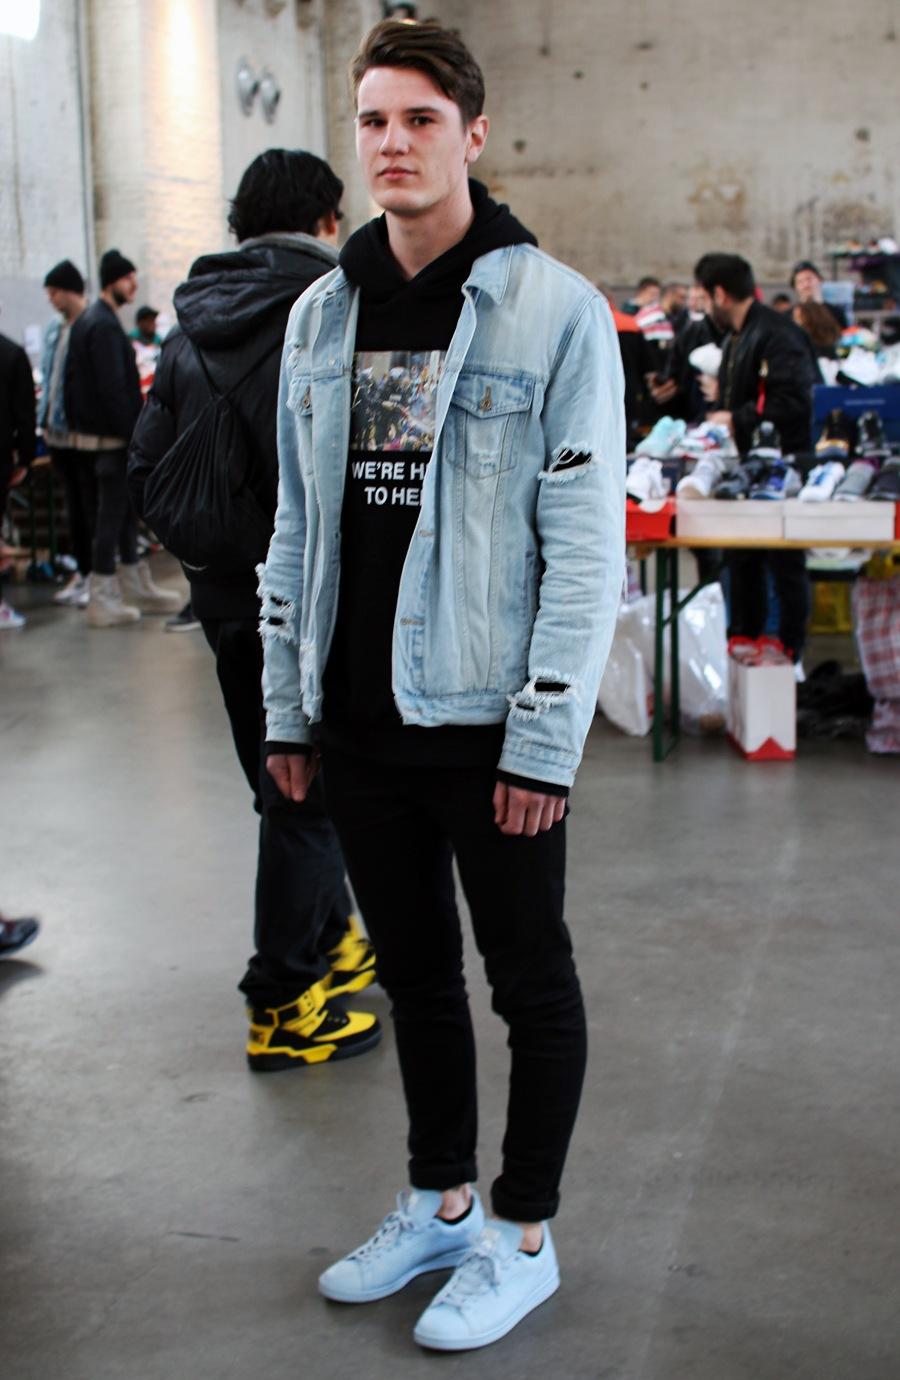 Sneakers Event Amsterdam Recap Seite 4 Von 6 Dead